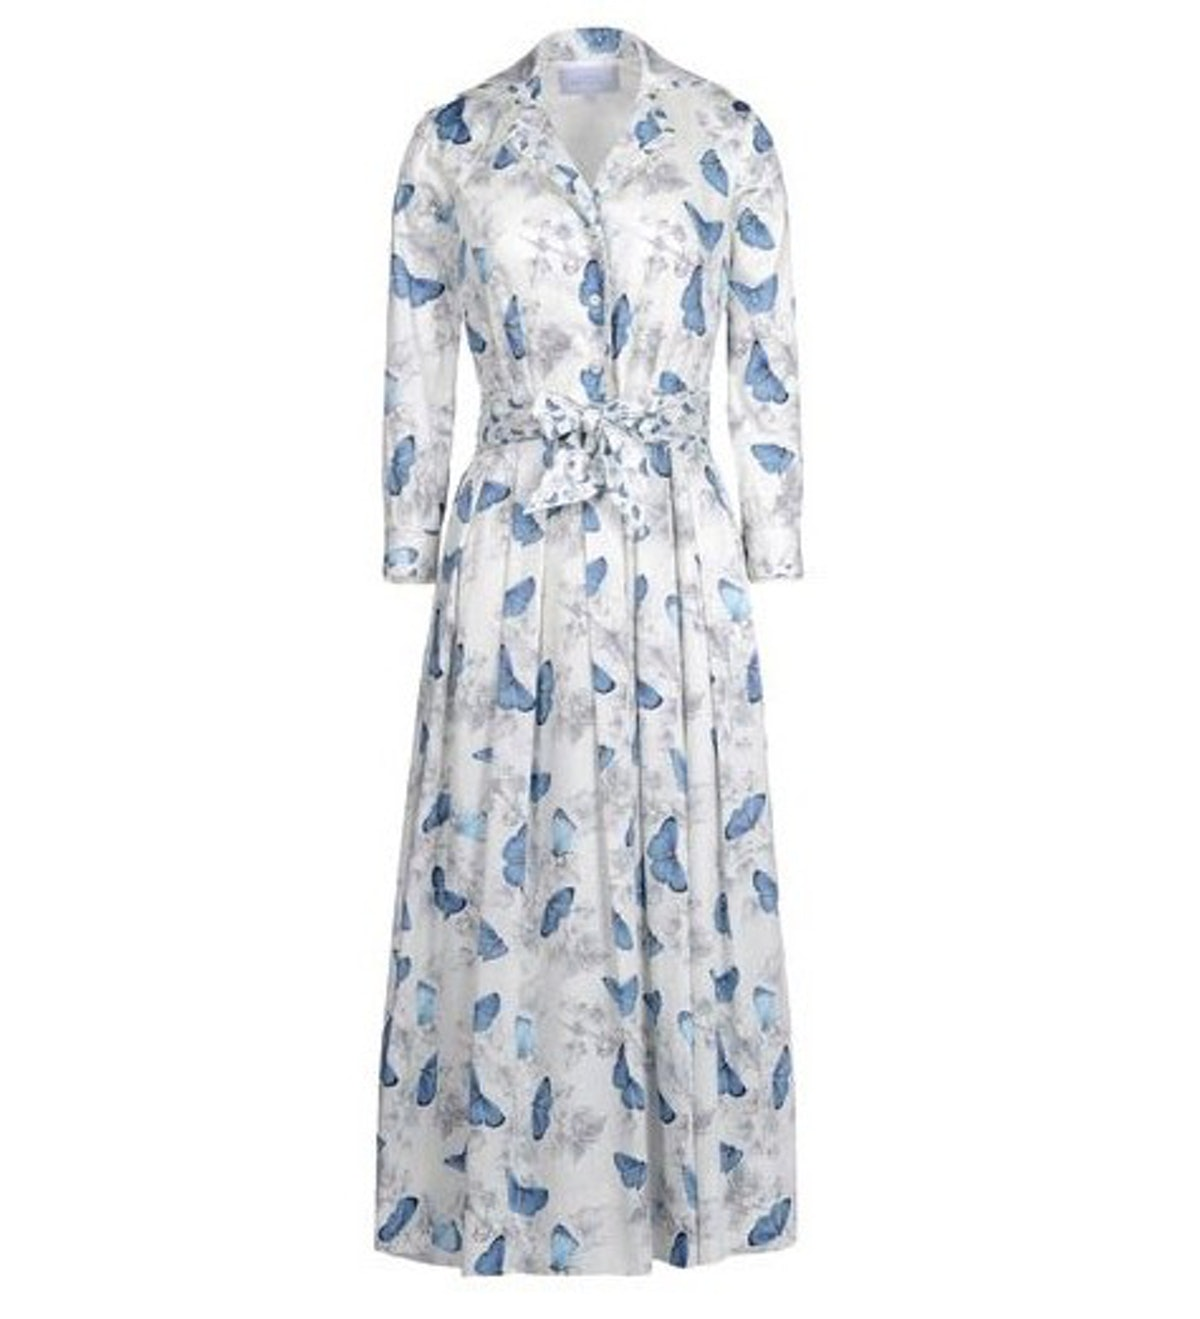 Luisa Beccaria Dress